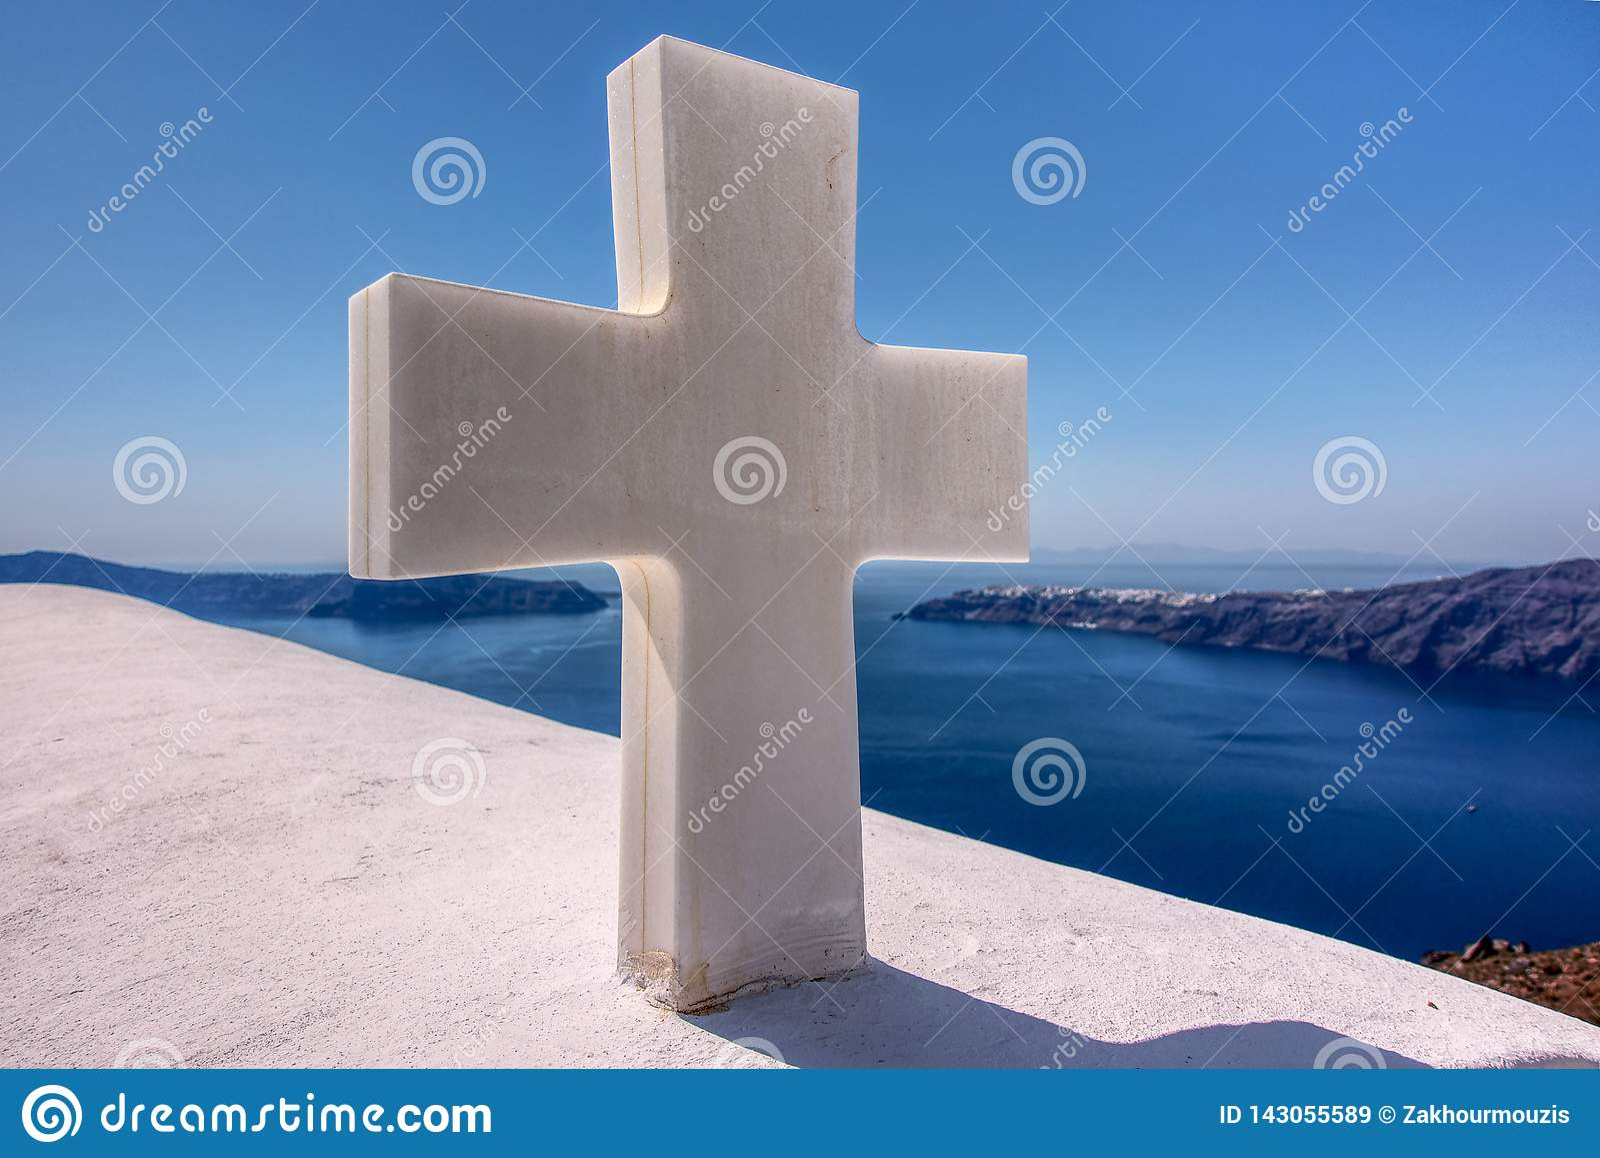 Peaceful cross in Santorini